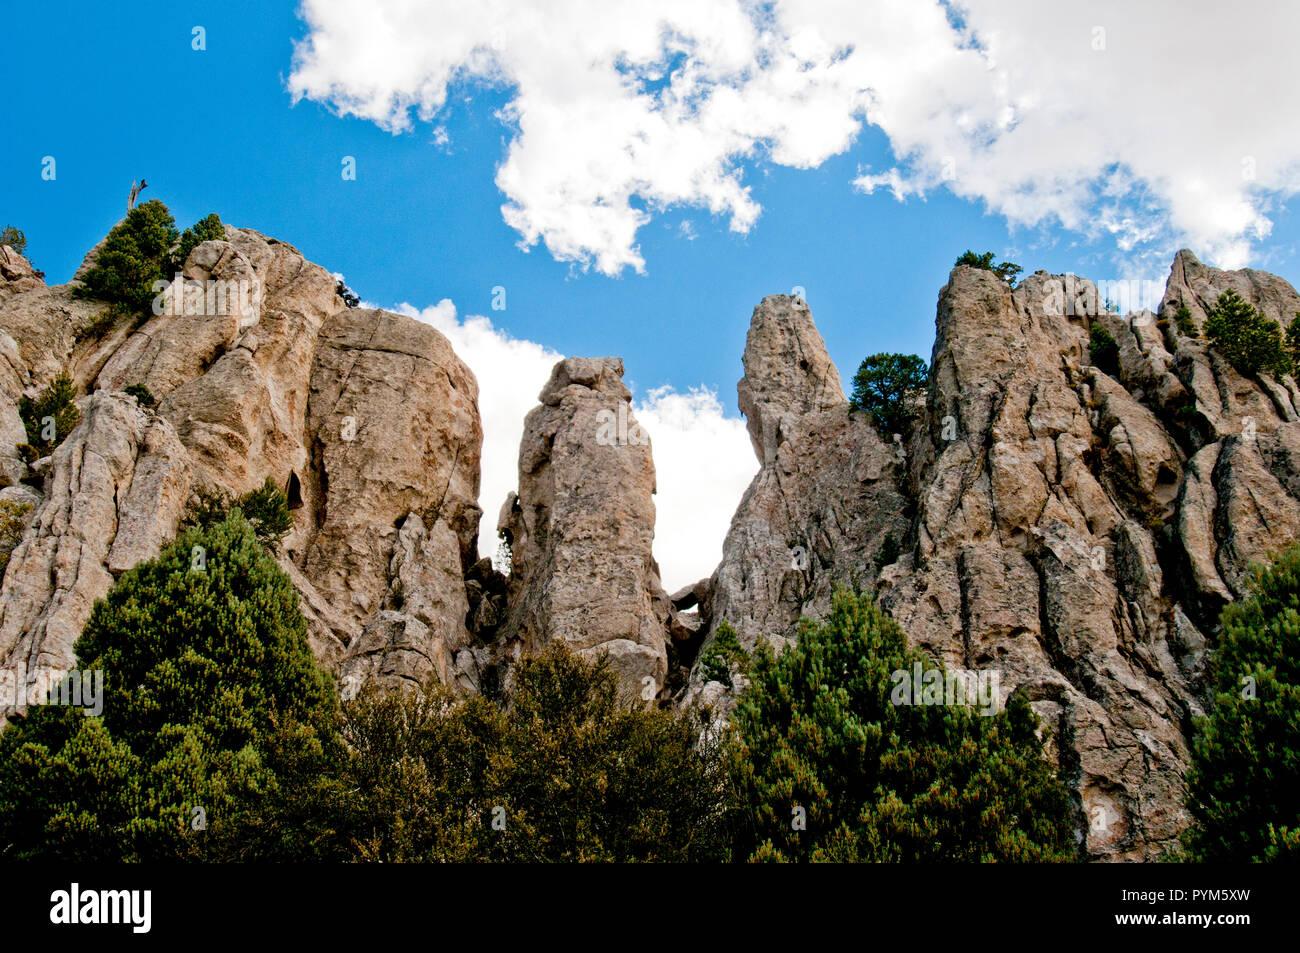 Pinnacles in Almo Pluton granite, City of Rocks National Reserve, Idaho - Stock Image